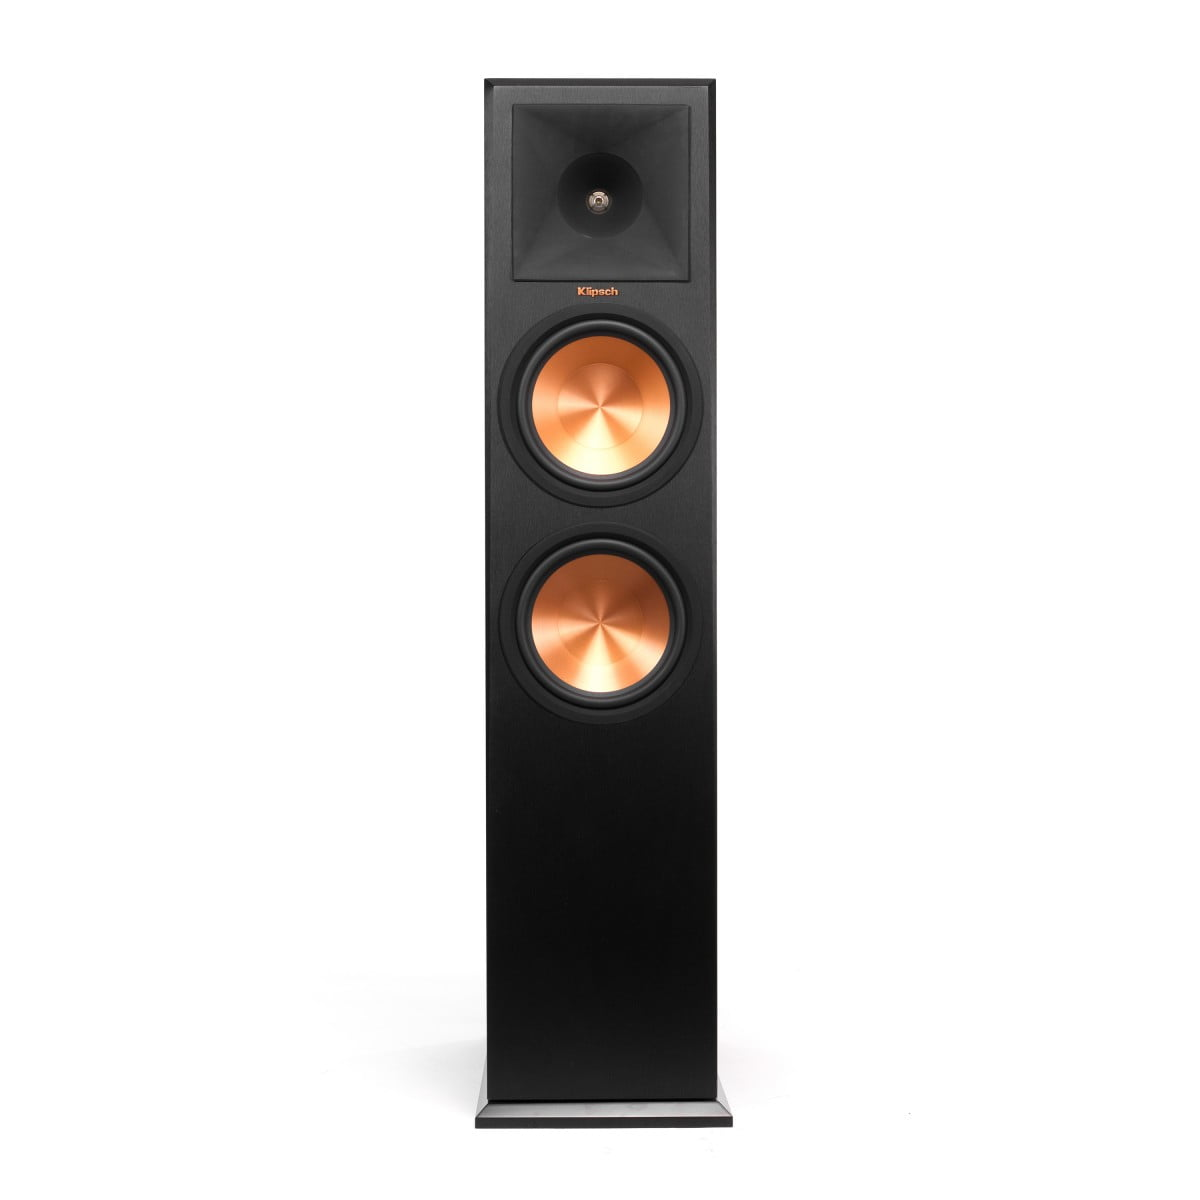 klipsch surround speakers. klipsch surround speakers